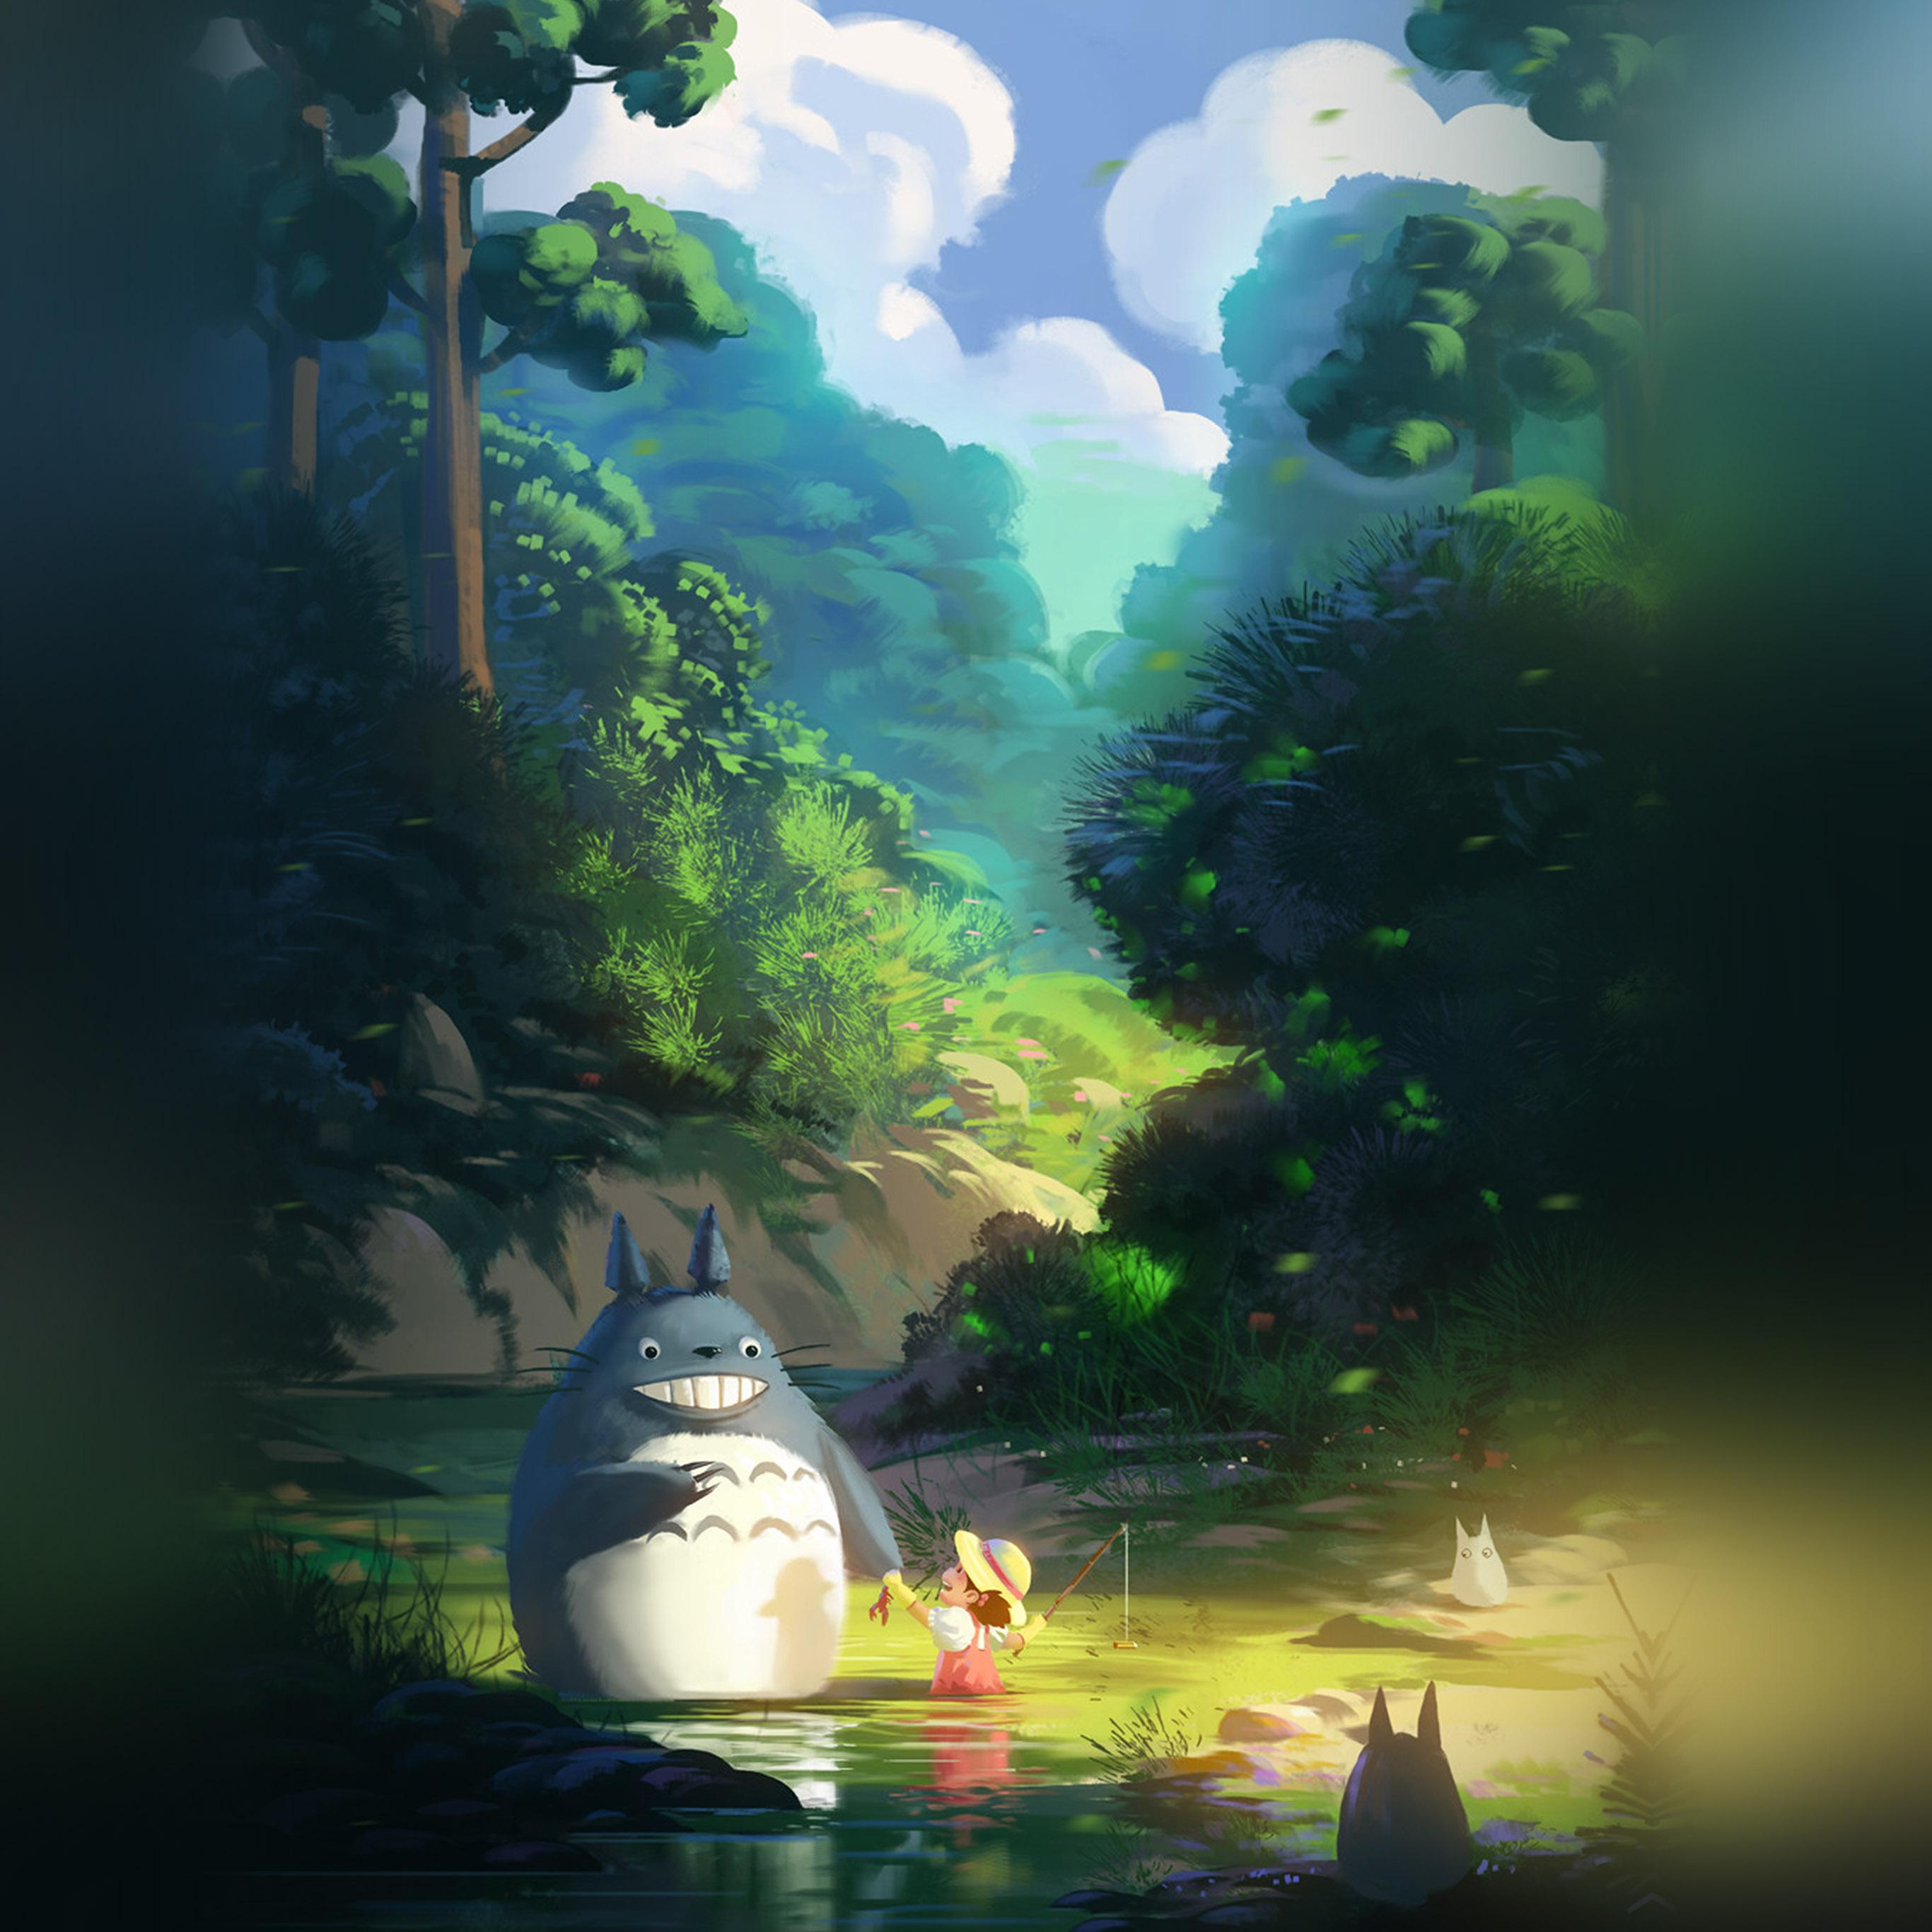 Av33 Totoro Anime Liang Xing Illustration Art Wallpaper